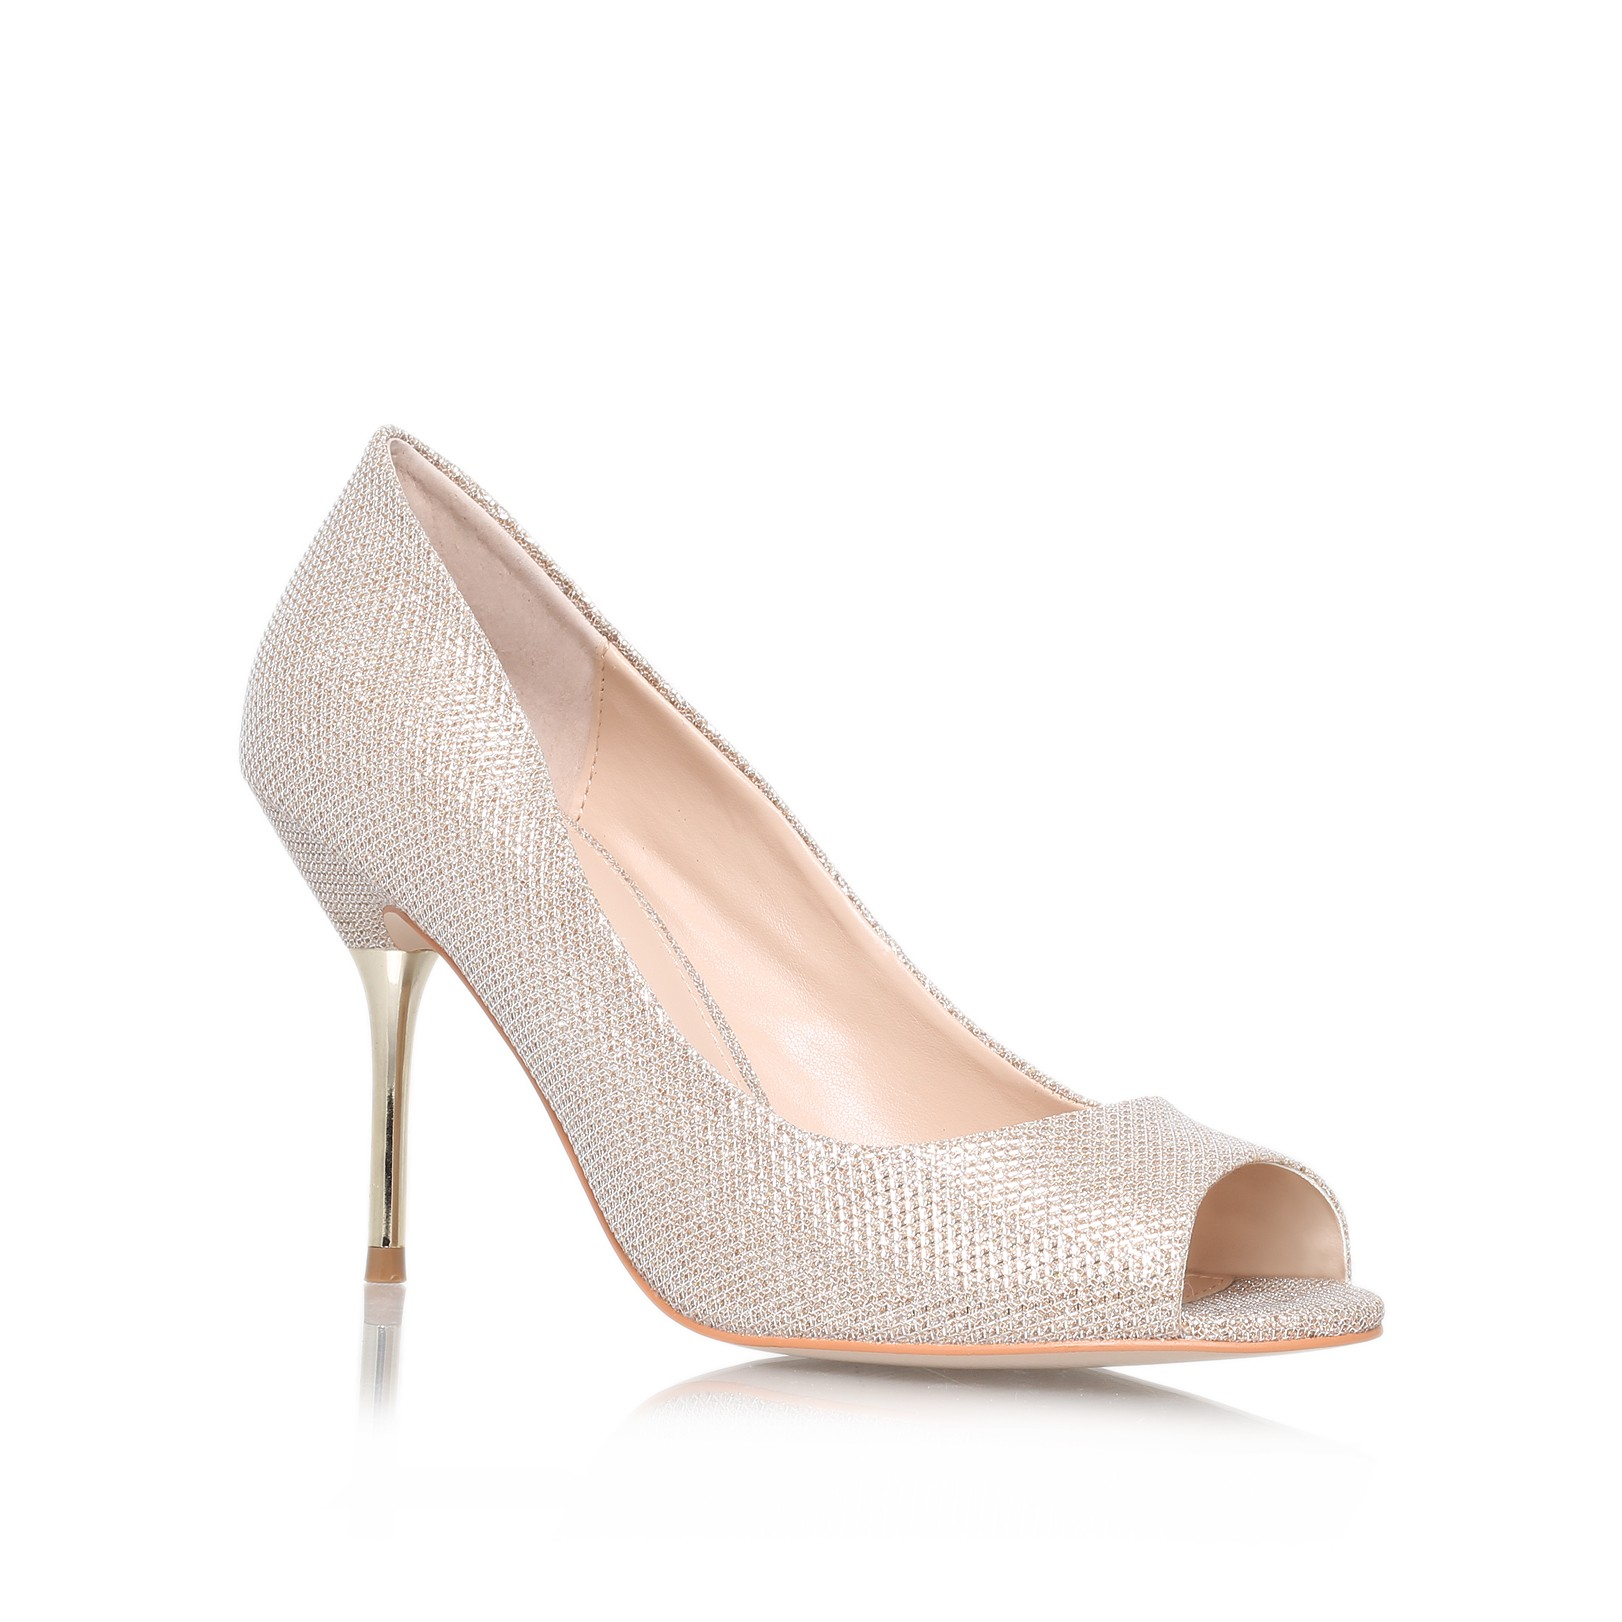 valentino wedding shoes photo - 1